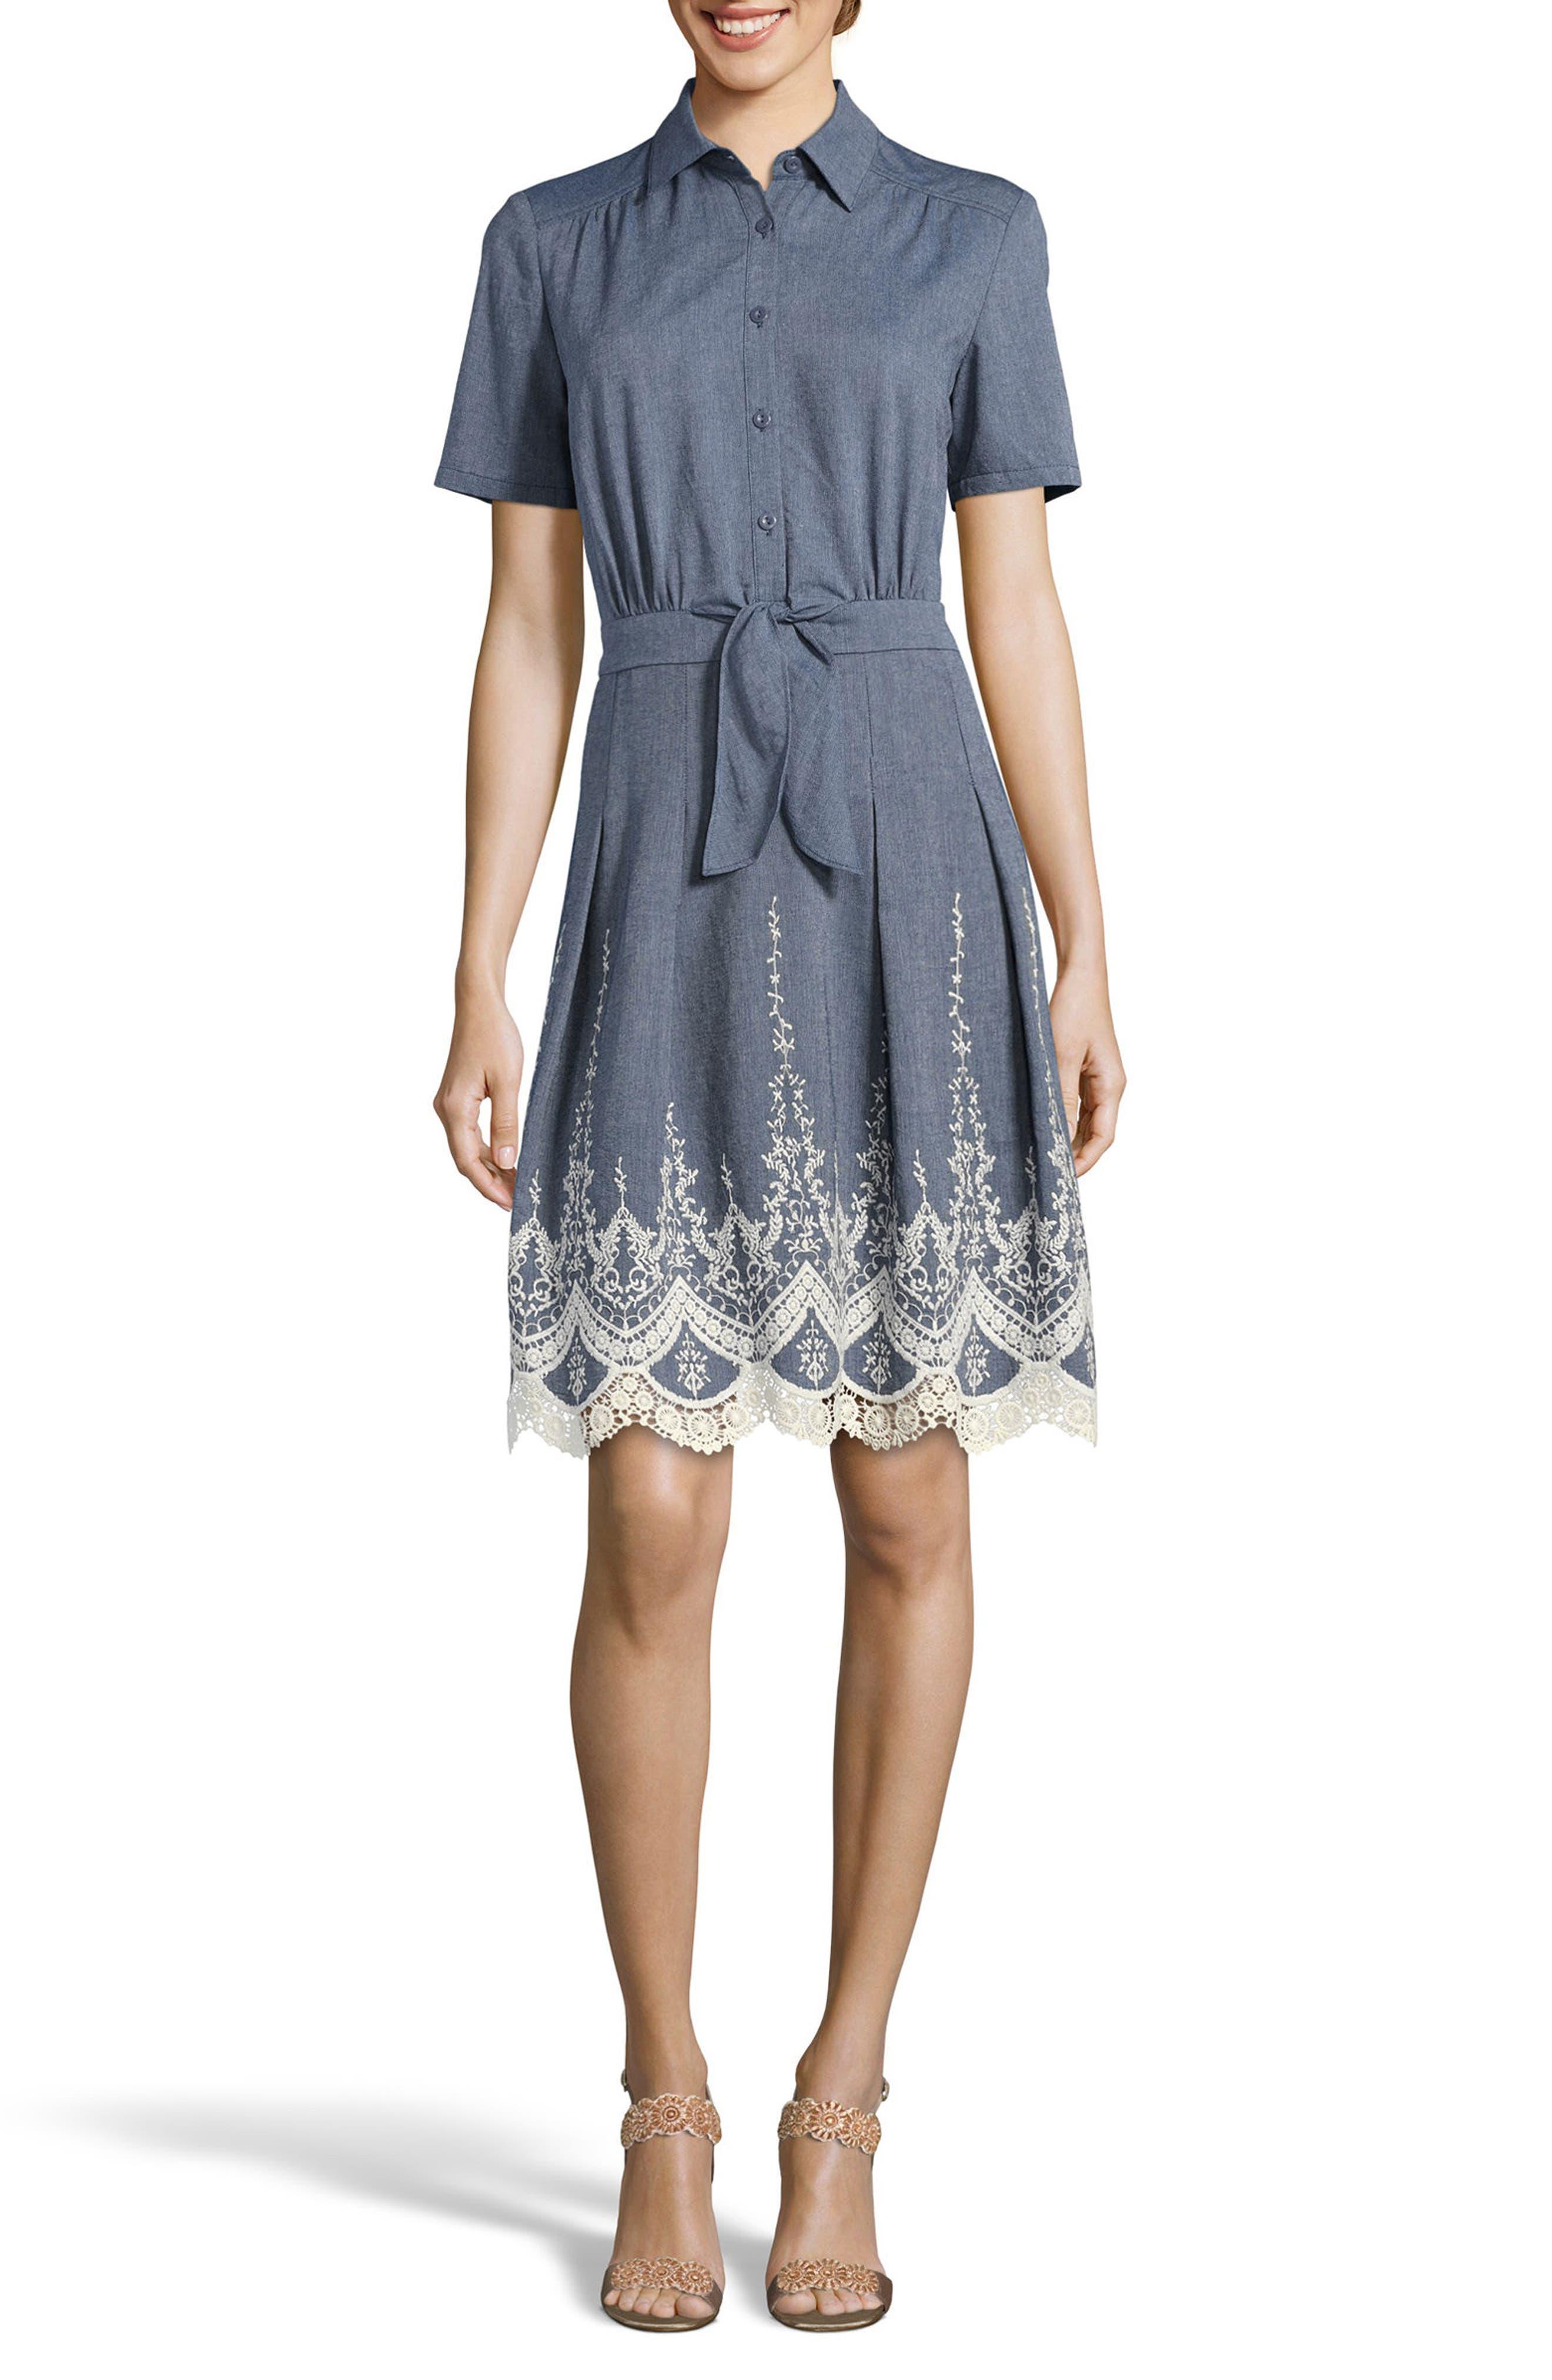 Lace Trim Denim Shirtdress,                             Main thumbnail 1, color,                             Blue/ Ivory